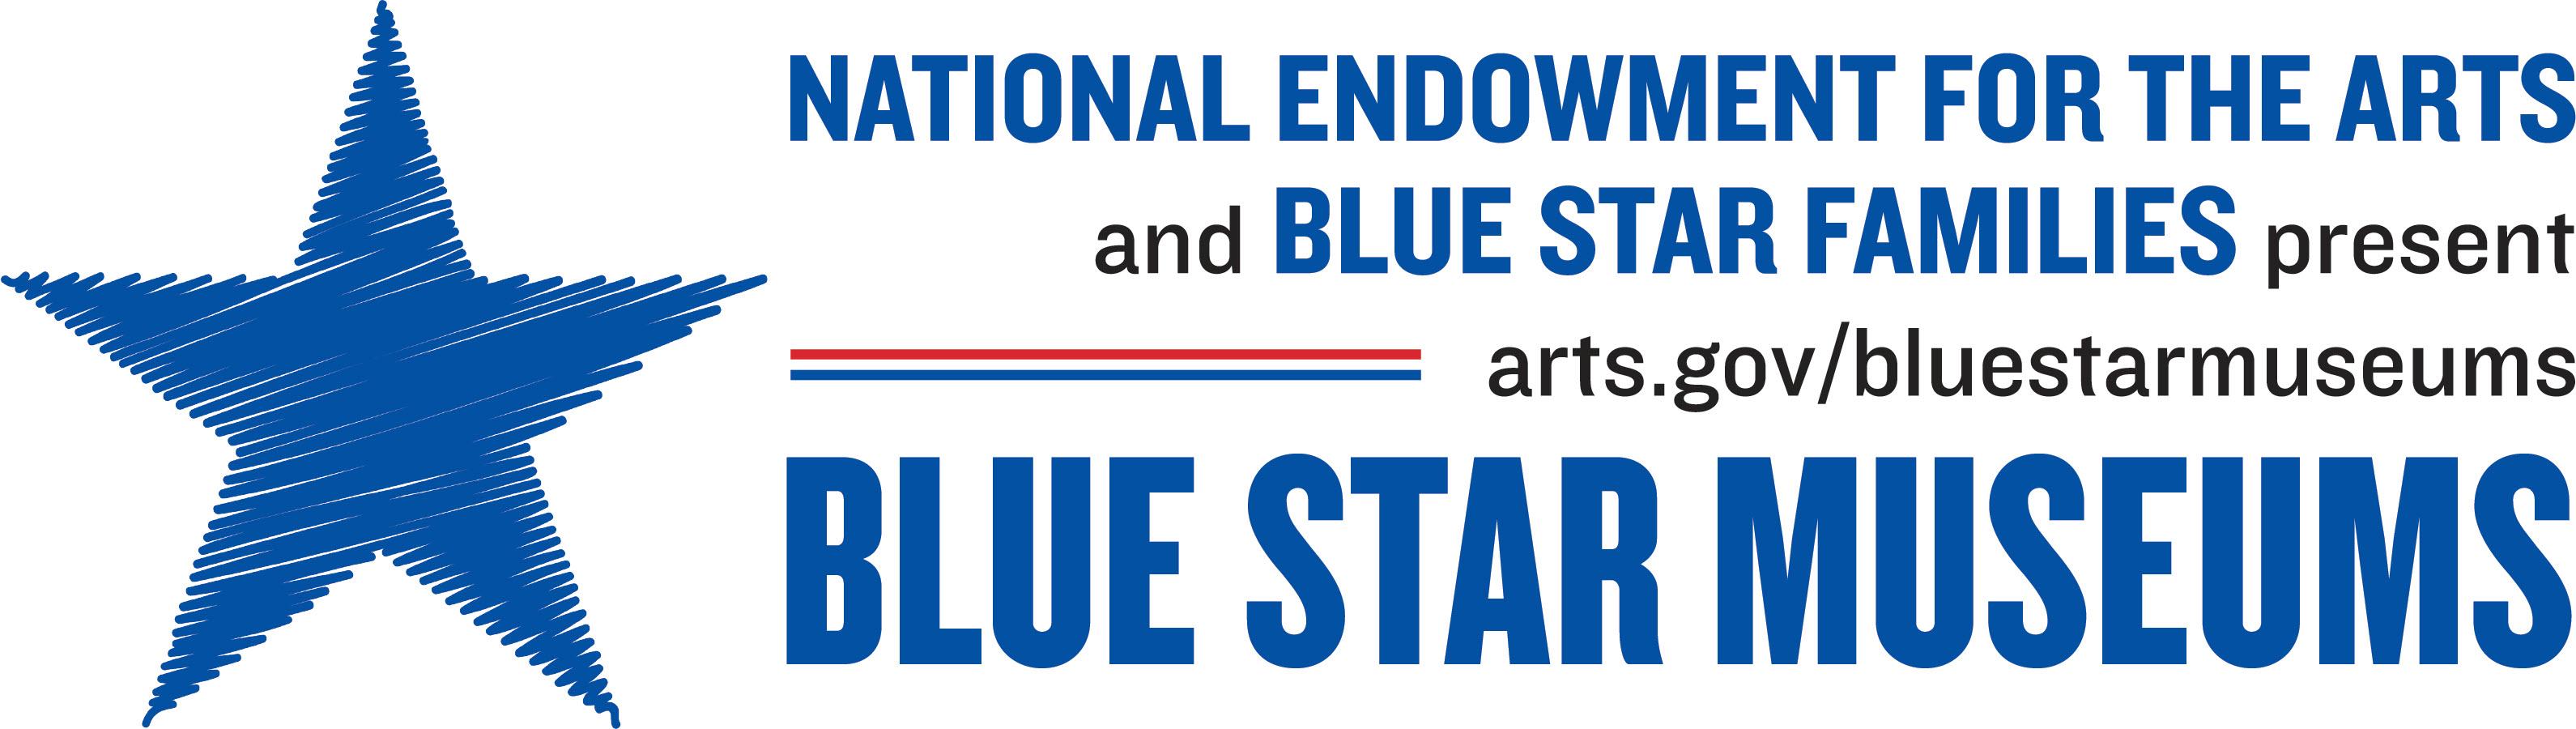 Blue Star Museums logo